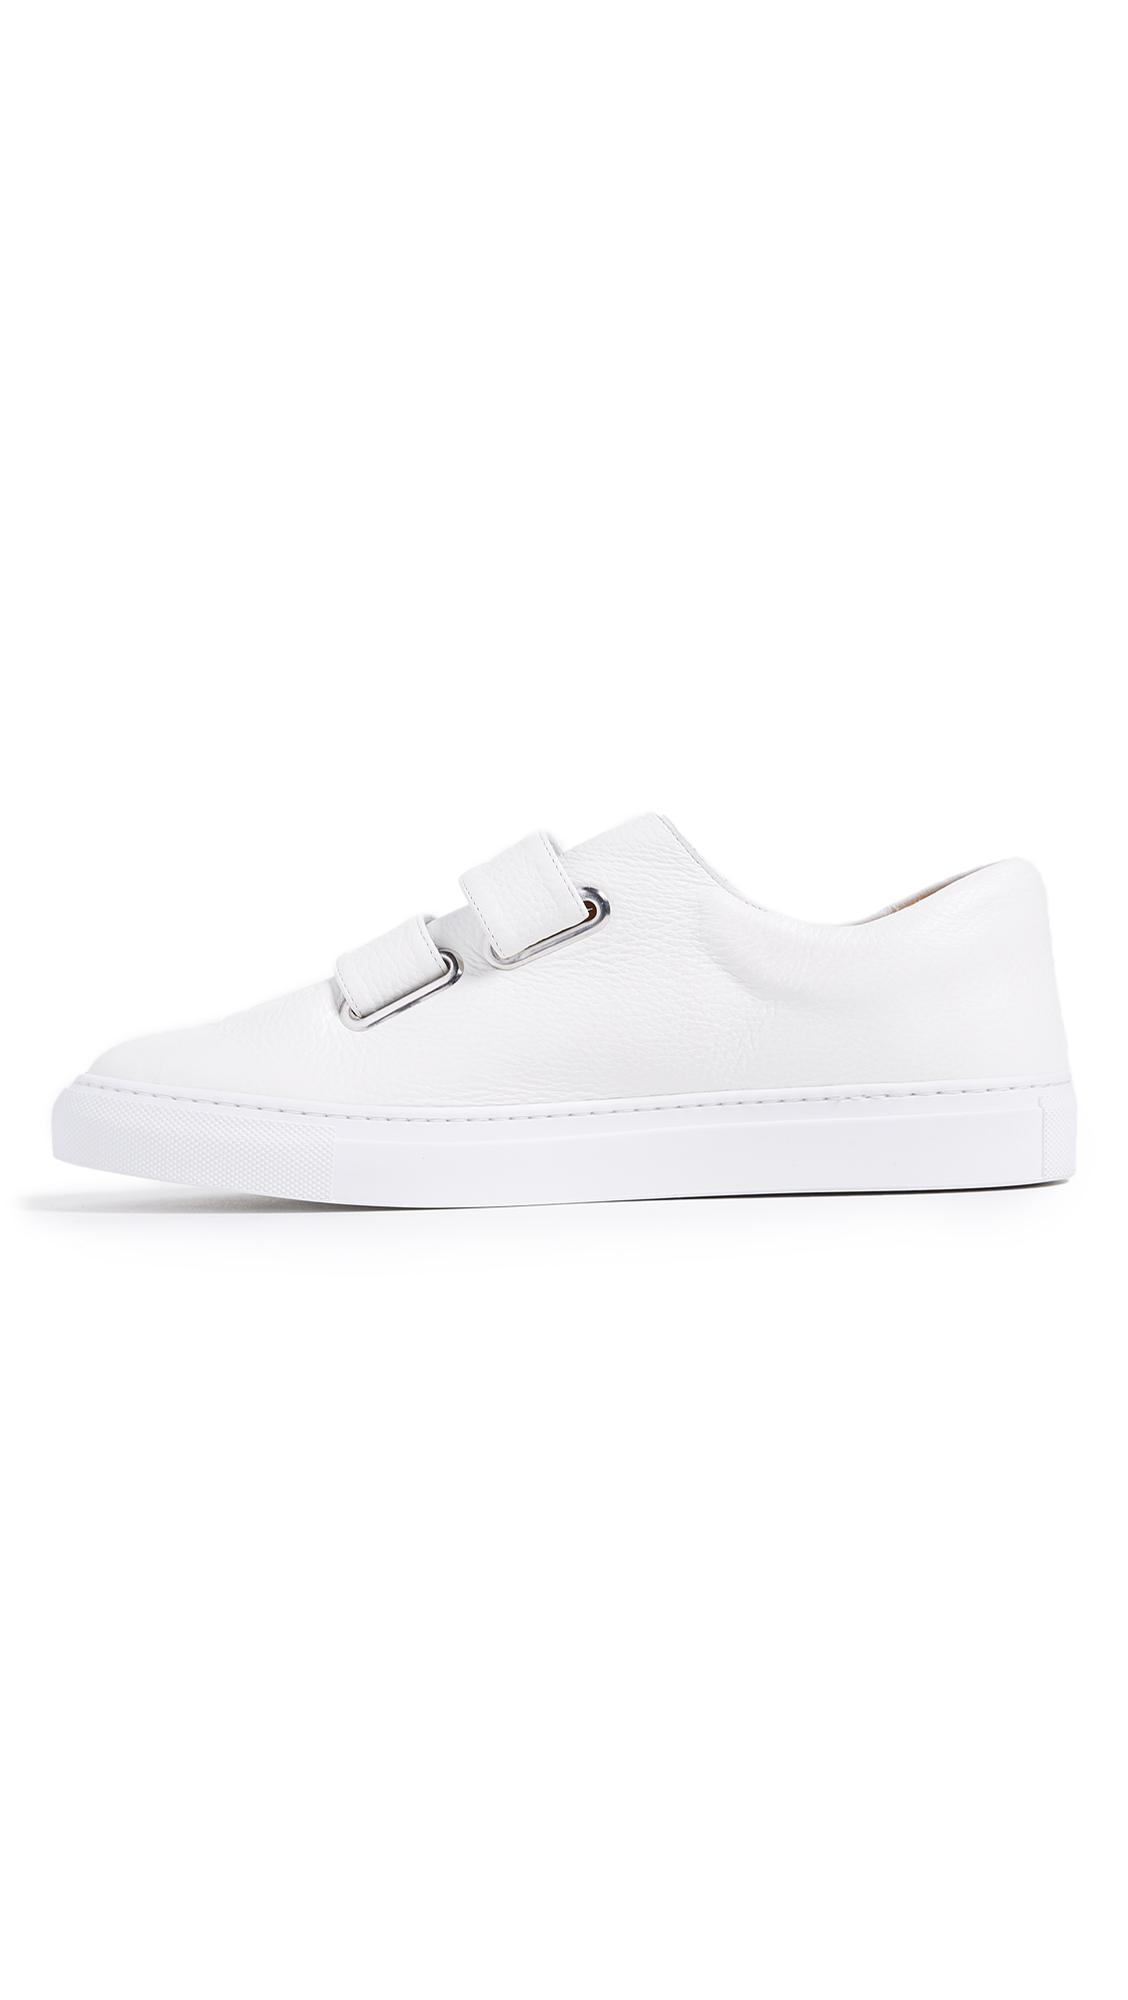 Rudy Leather Double Strap Velcro Sneakers - White Solovi��re 3VvQ8rYXkq